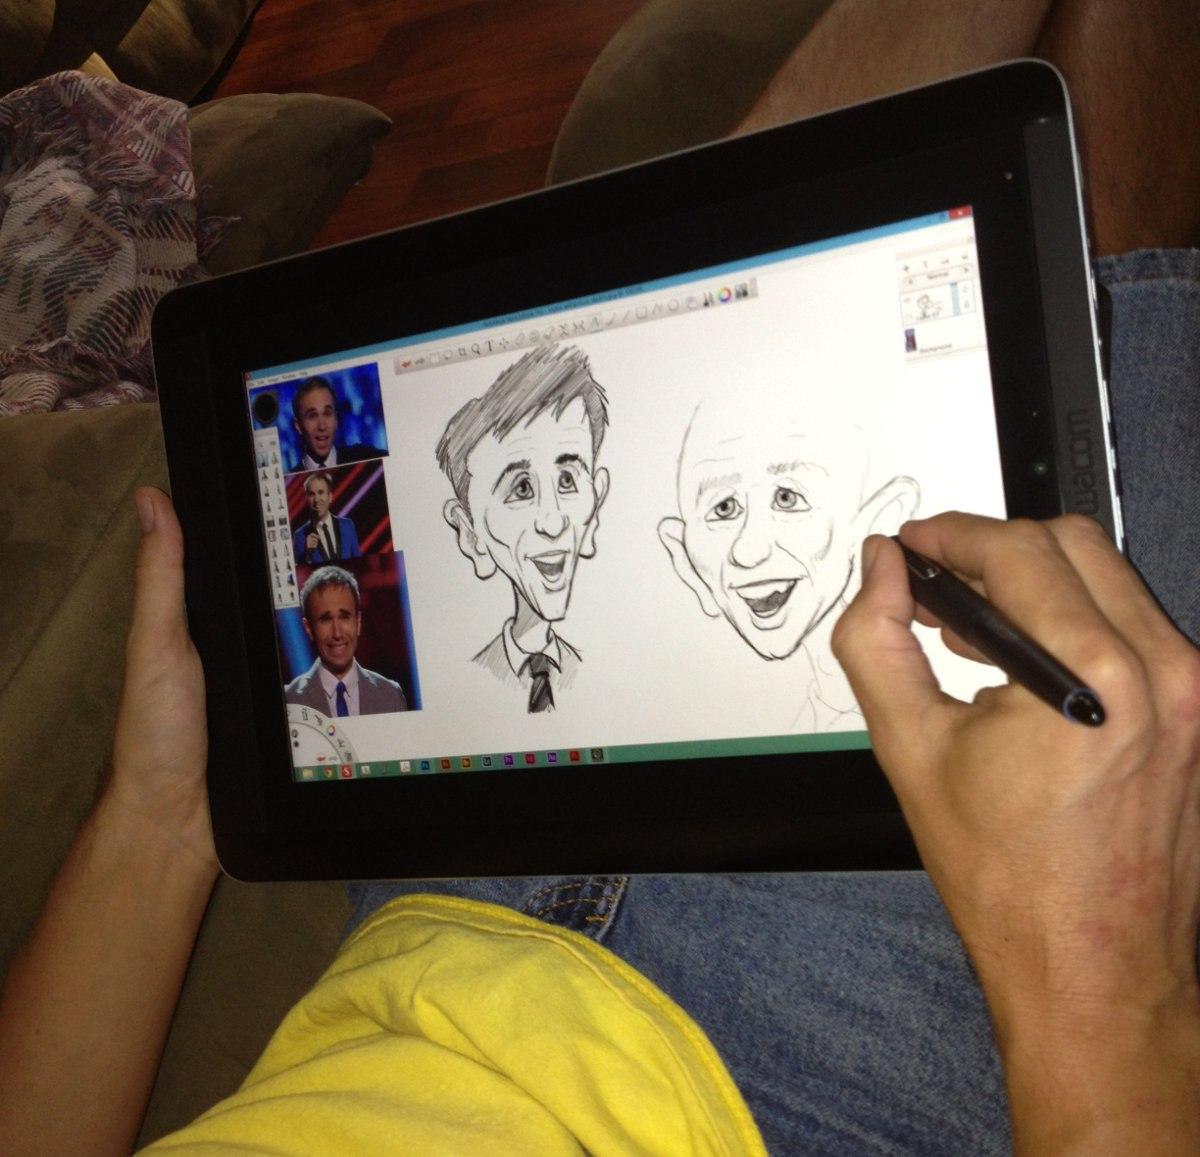 Wacom Cintiq Drawings Digital Drawing Anywhere With